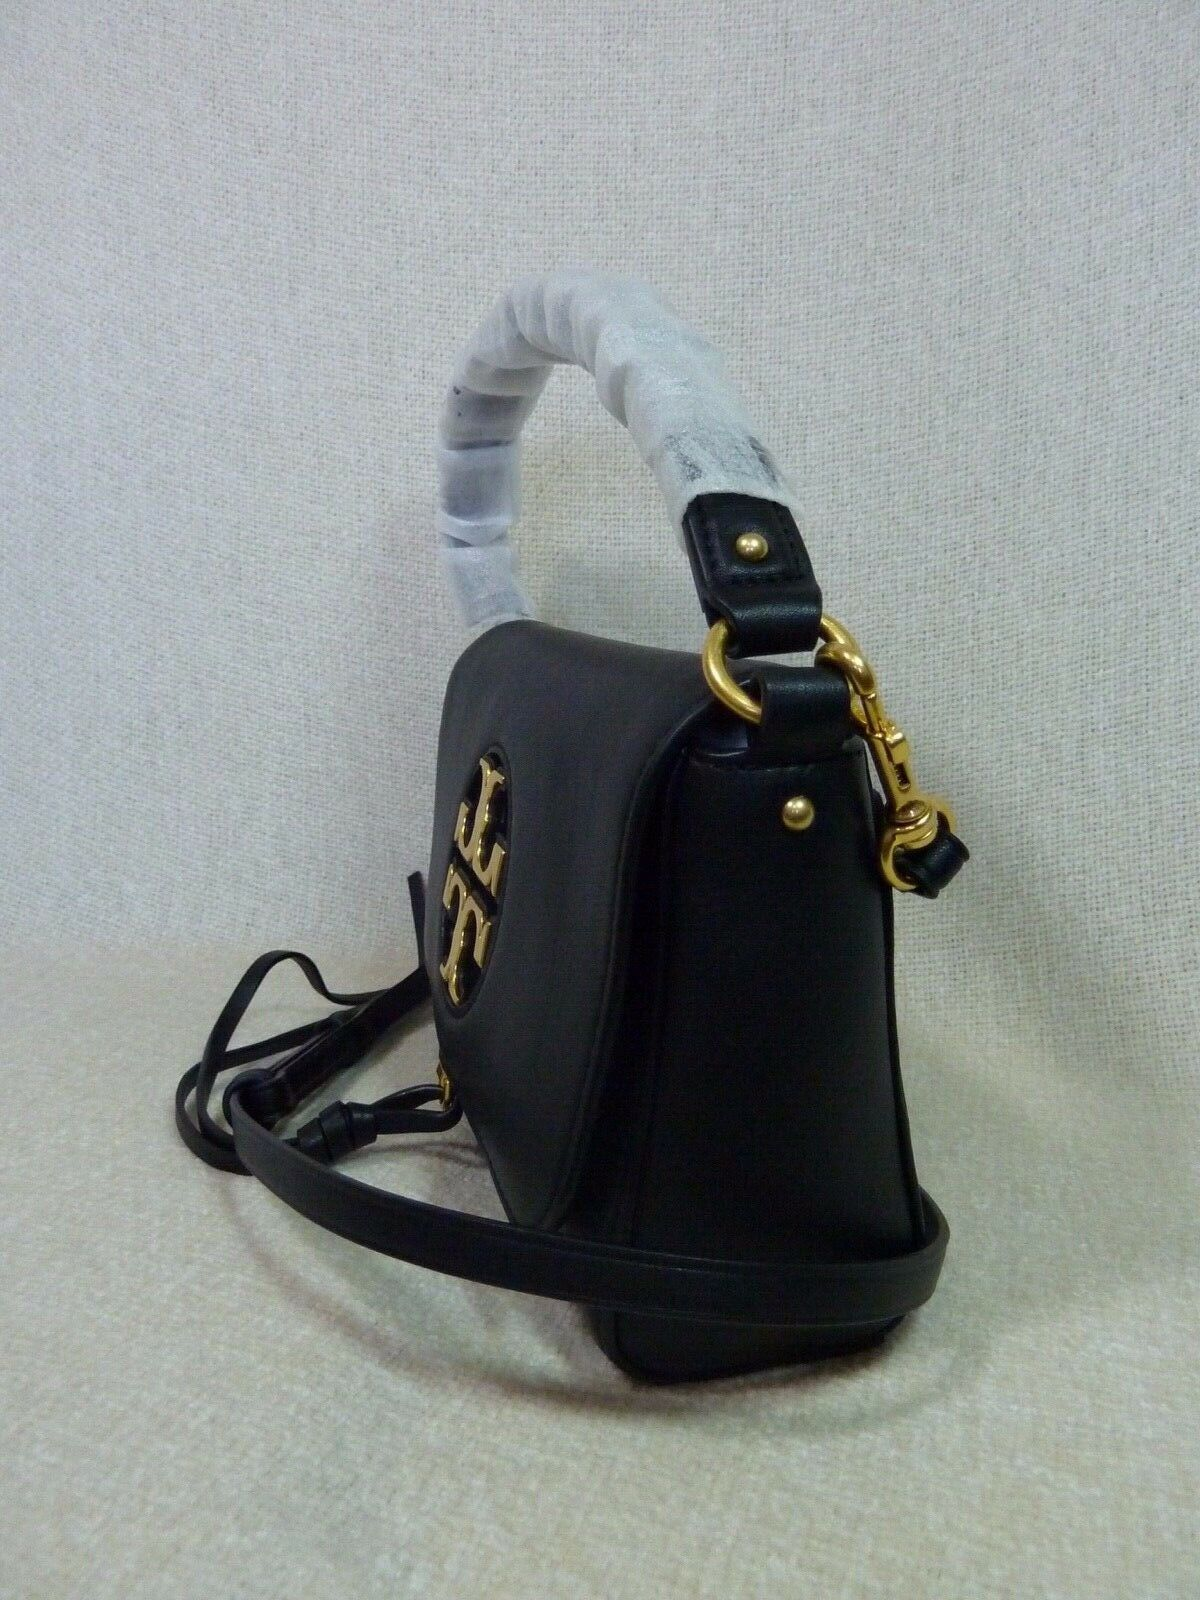 NWT Tory Burch Black Leather Miller Metal Cross-Body Bag/Mini Shoulder Bag $398 image 4